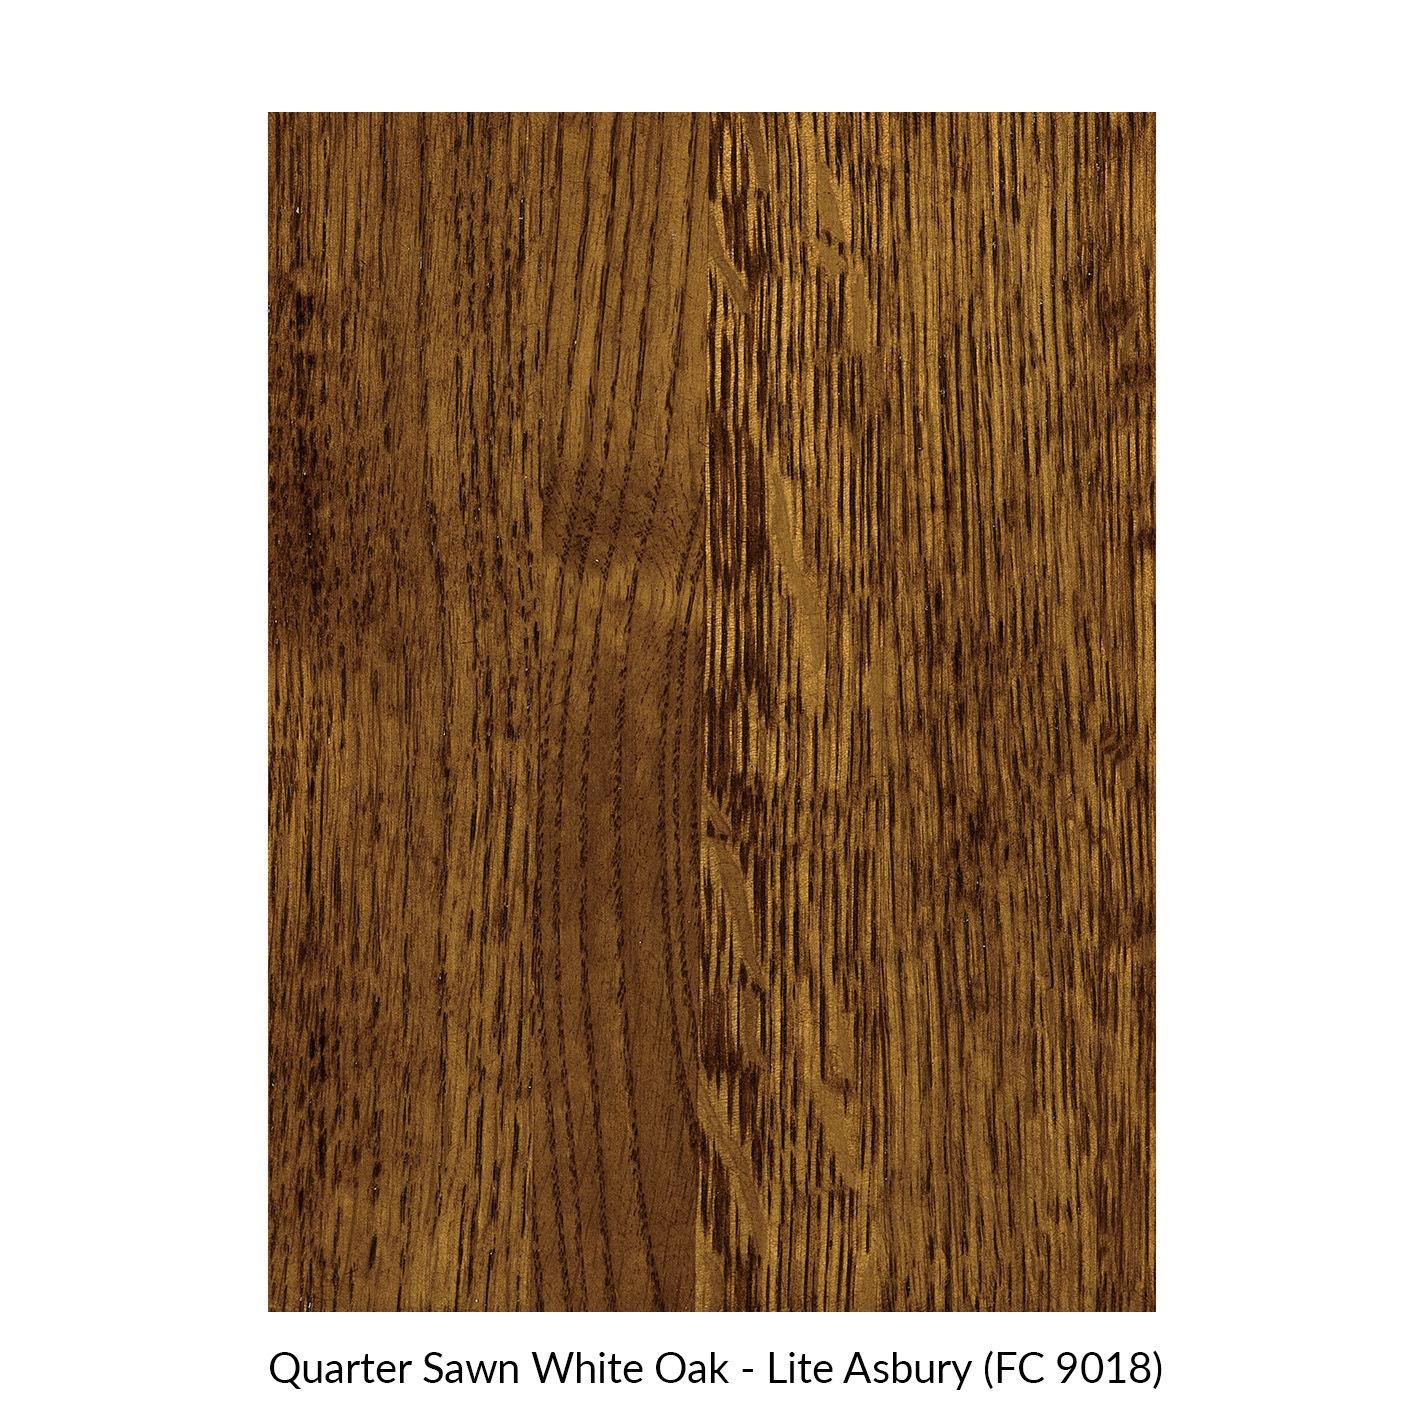 spectrum-quarter-sawn-white-oak-lite-asbury-fc-9018.jpg